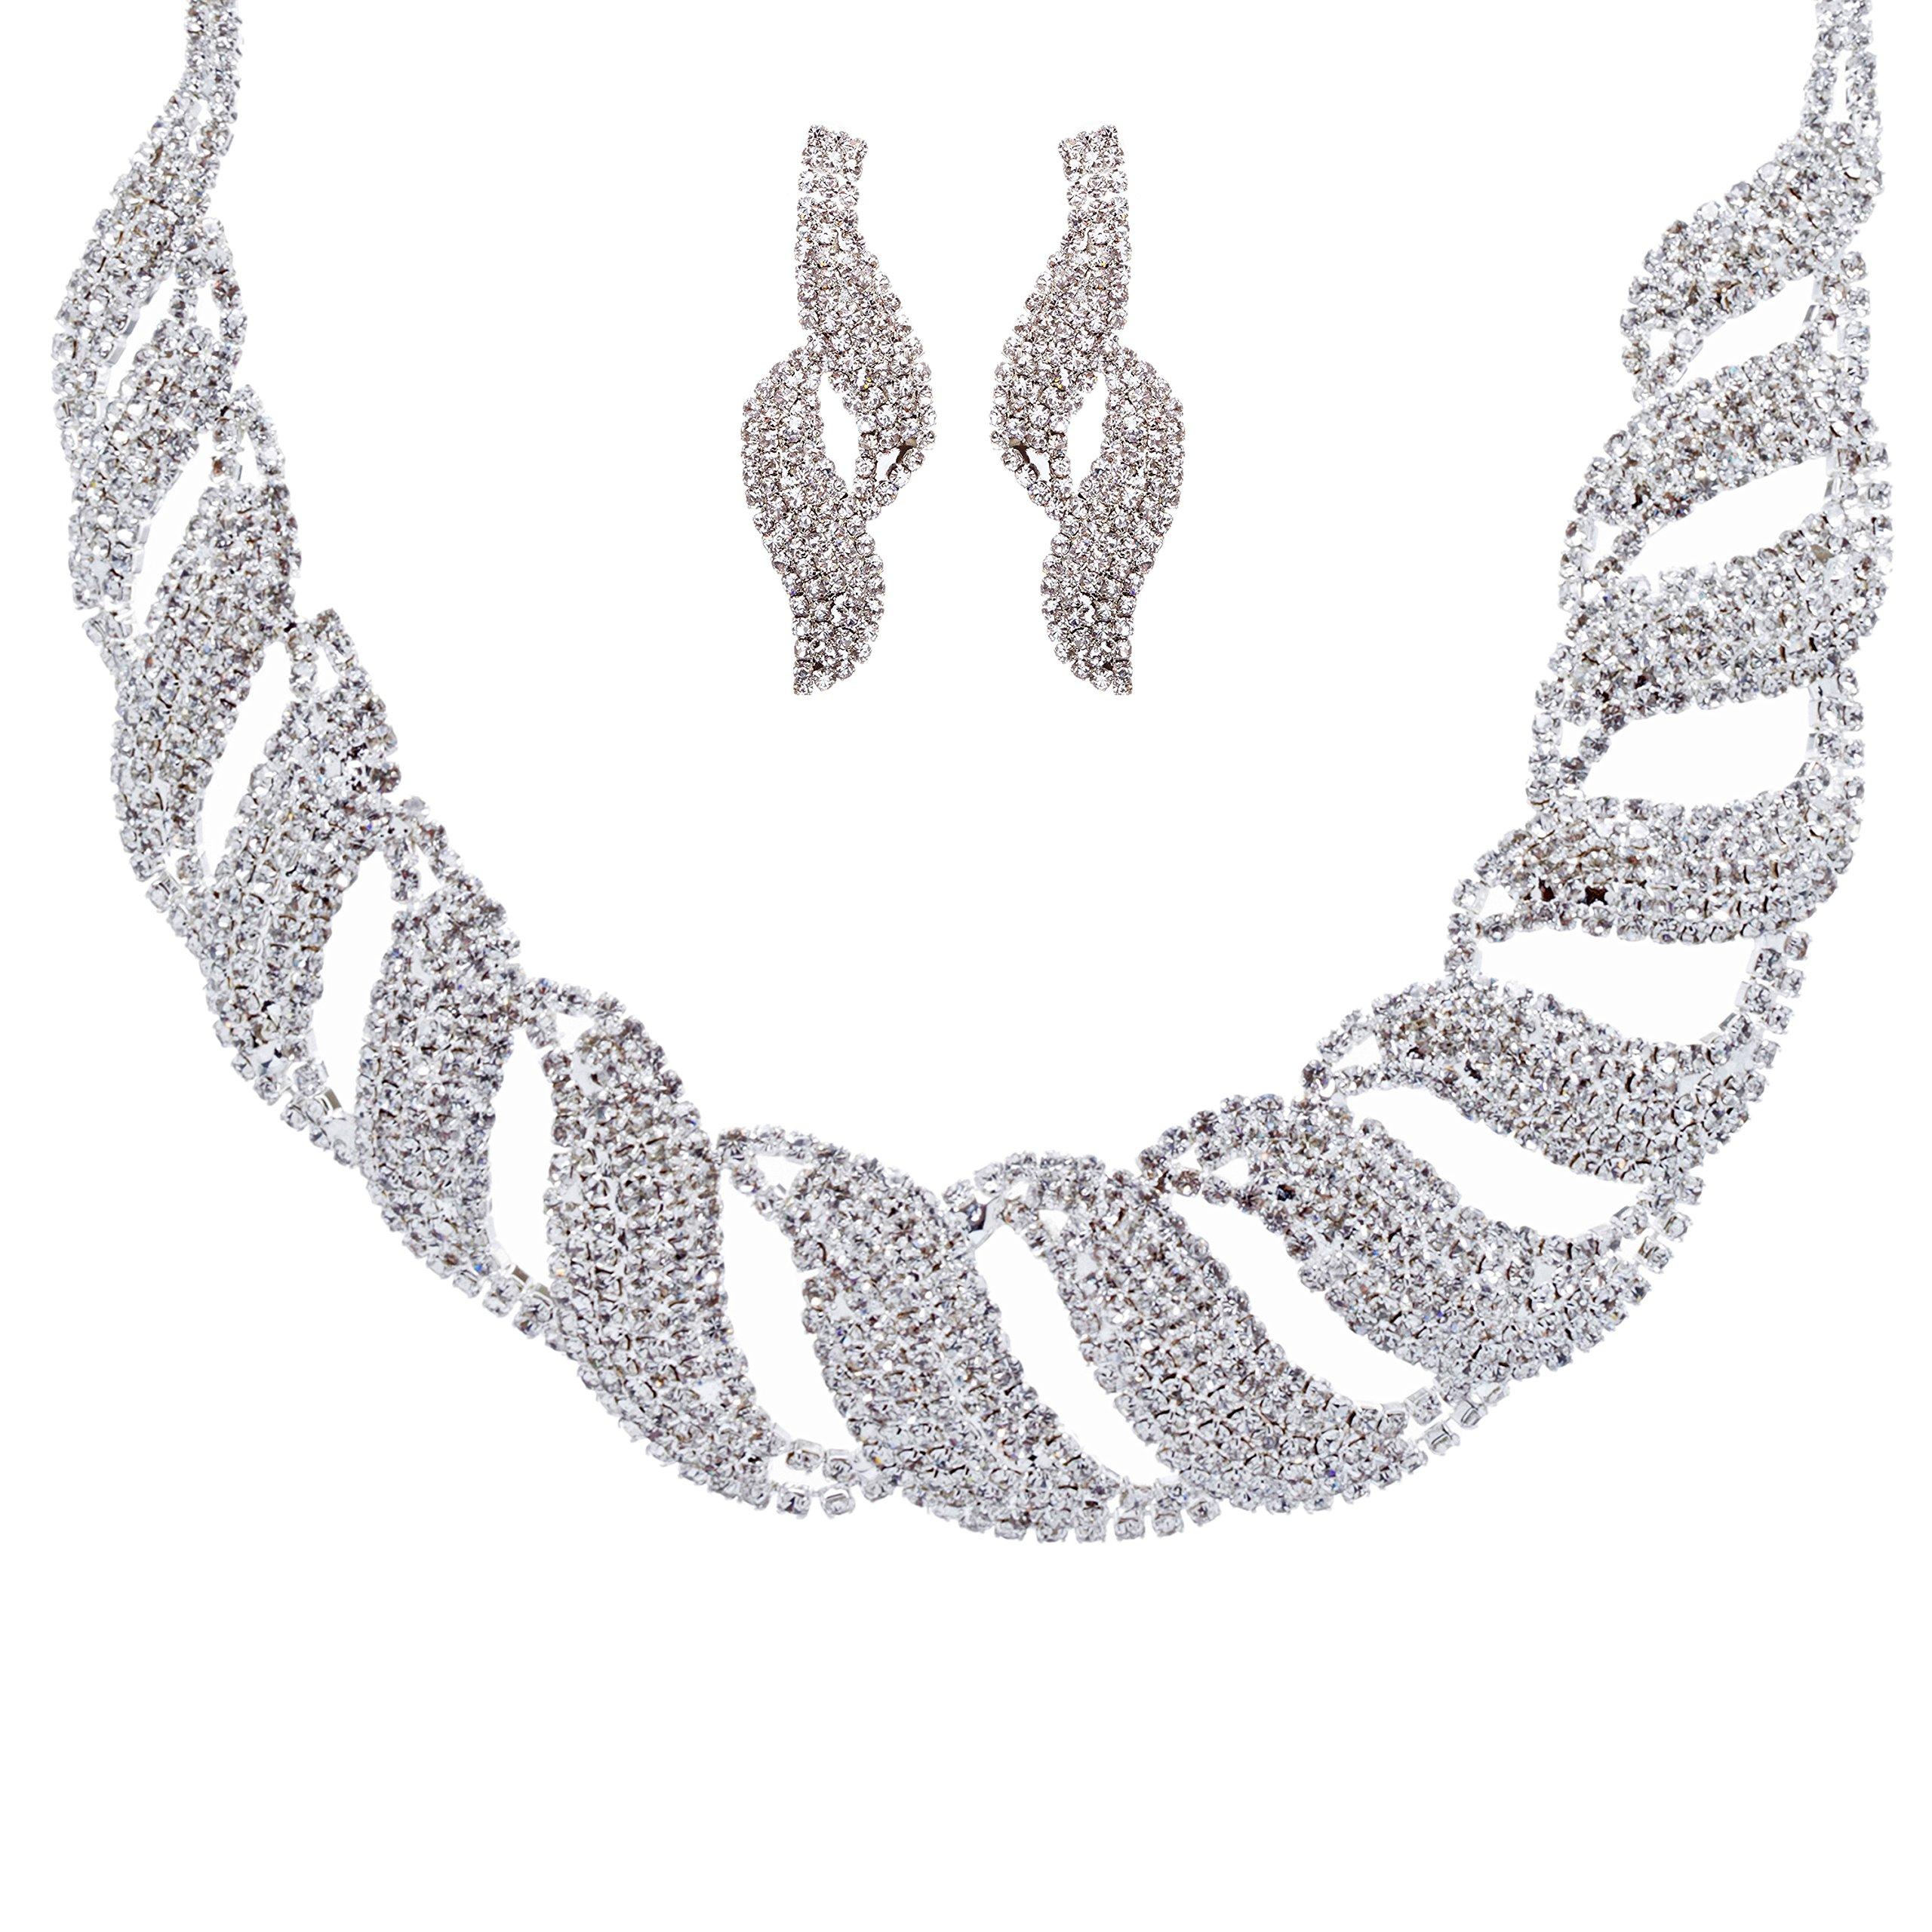 ACCESSORIESFOREVER Women Bridal Wedding Jewelry Crystal Rhinestone Glamorous Bib Design Necklace J491 SLV